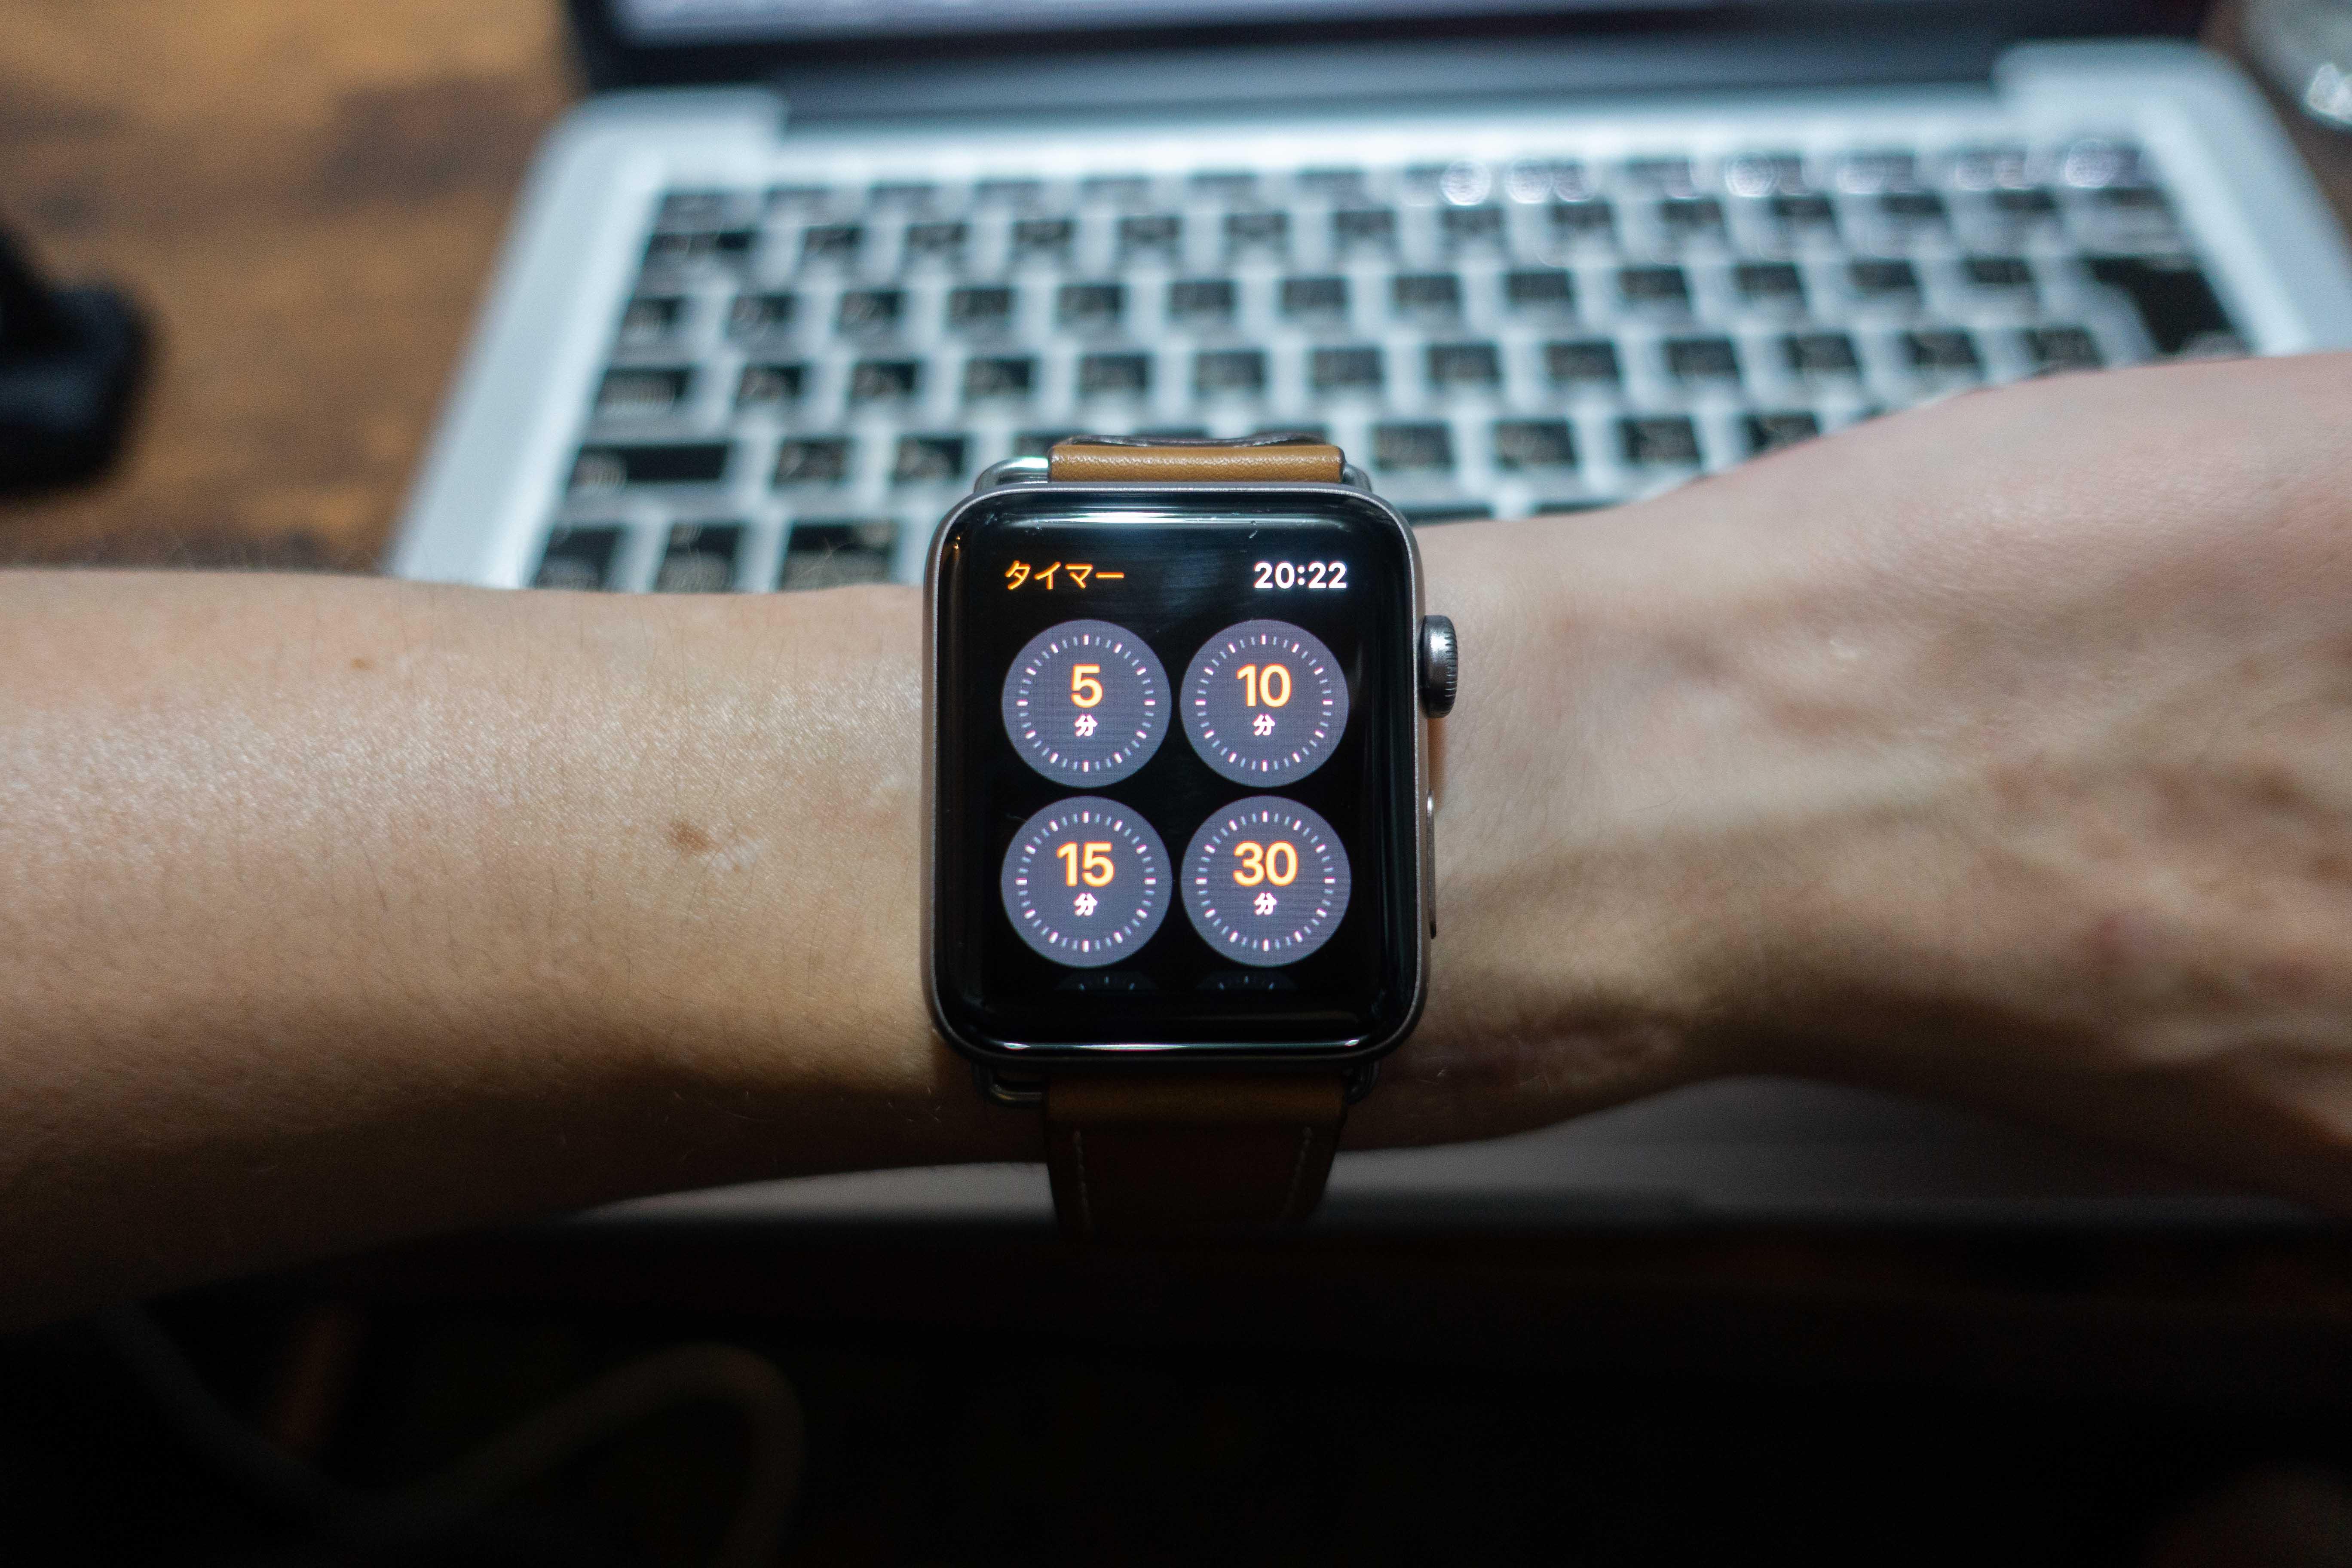 Apple Watchタイマー